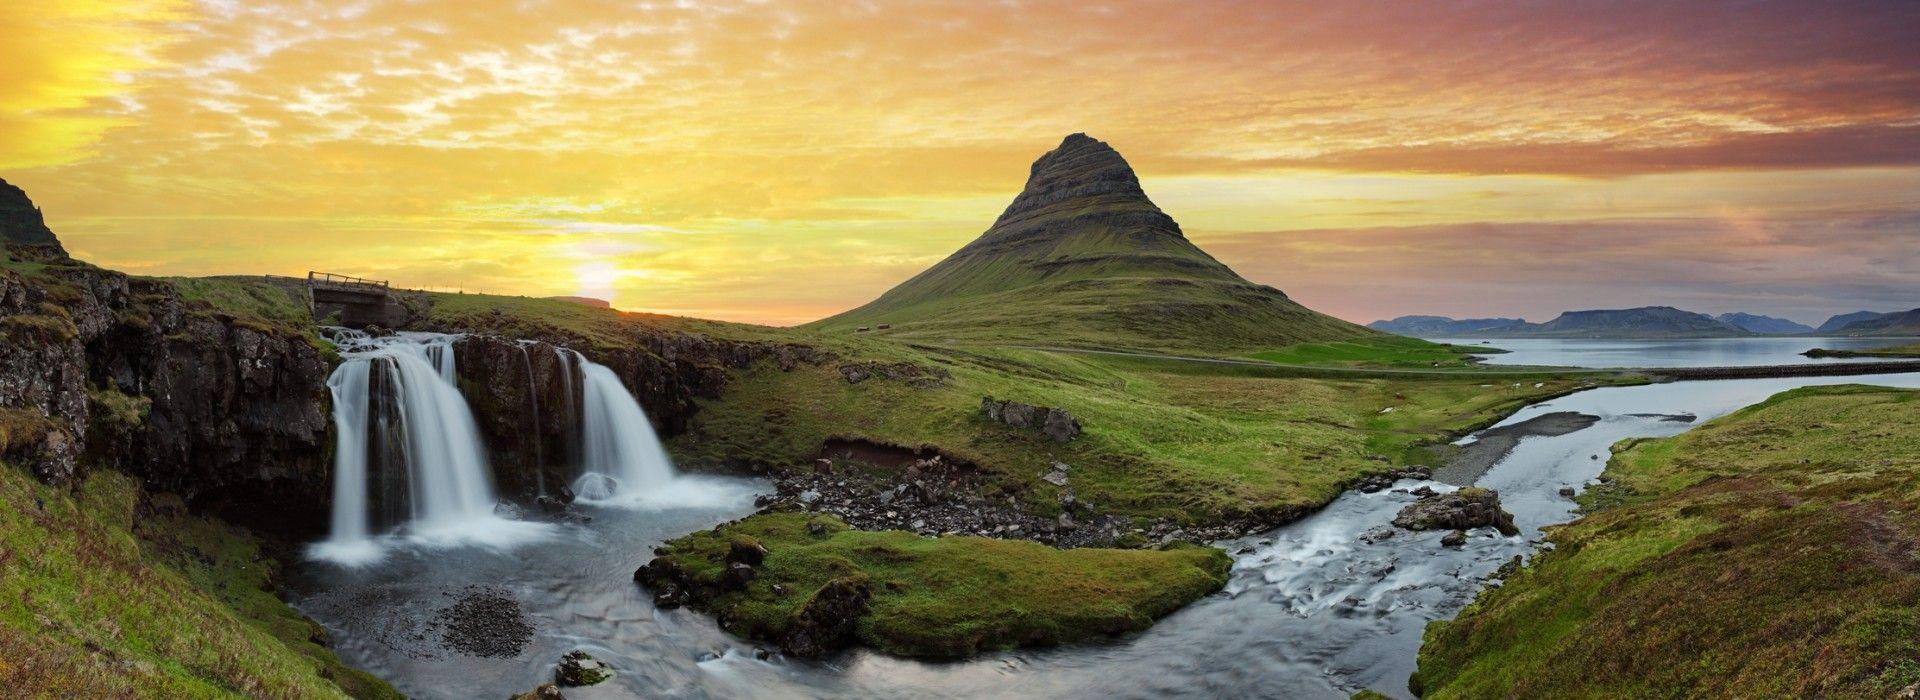 Natural landmarks sightseeing Tours in Iceland